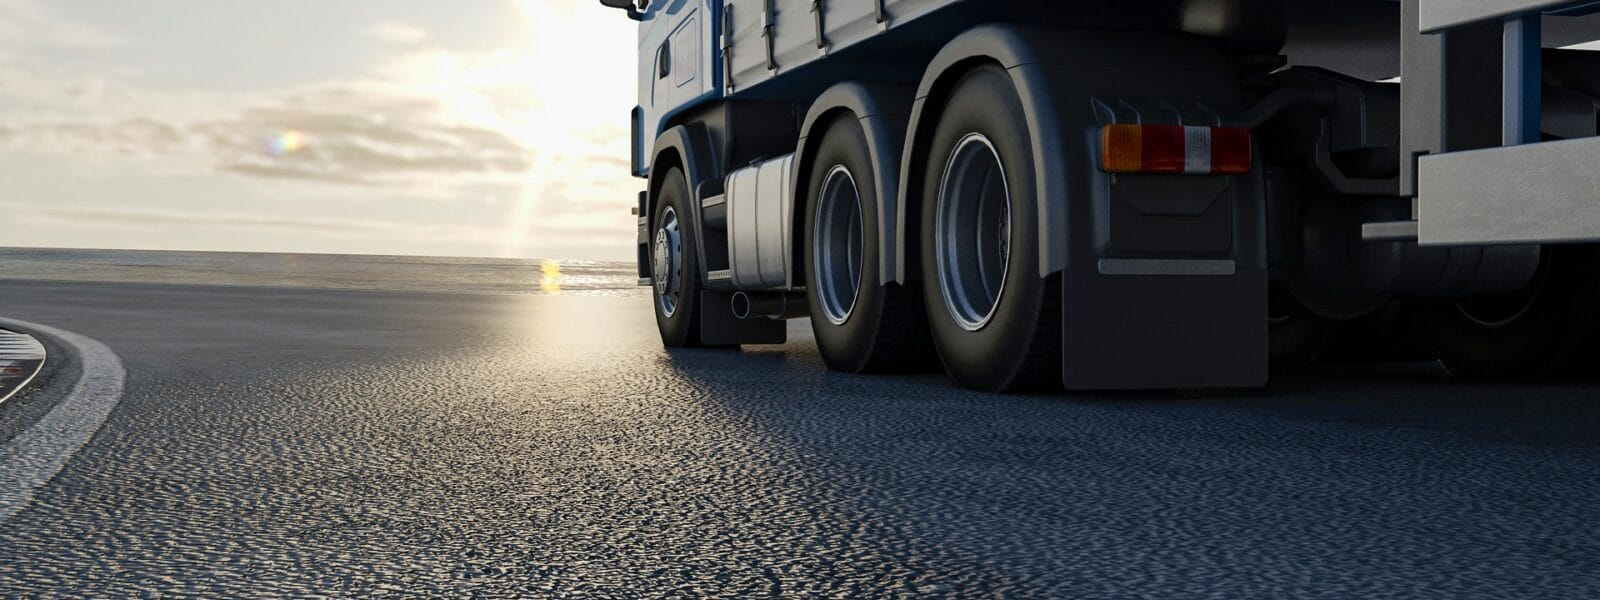 Th Trucks (EVW Holding)